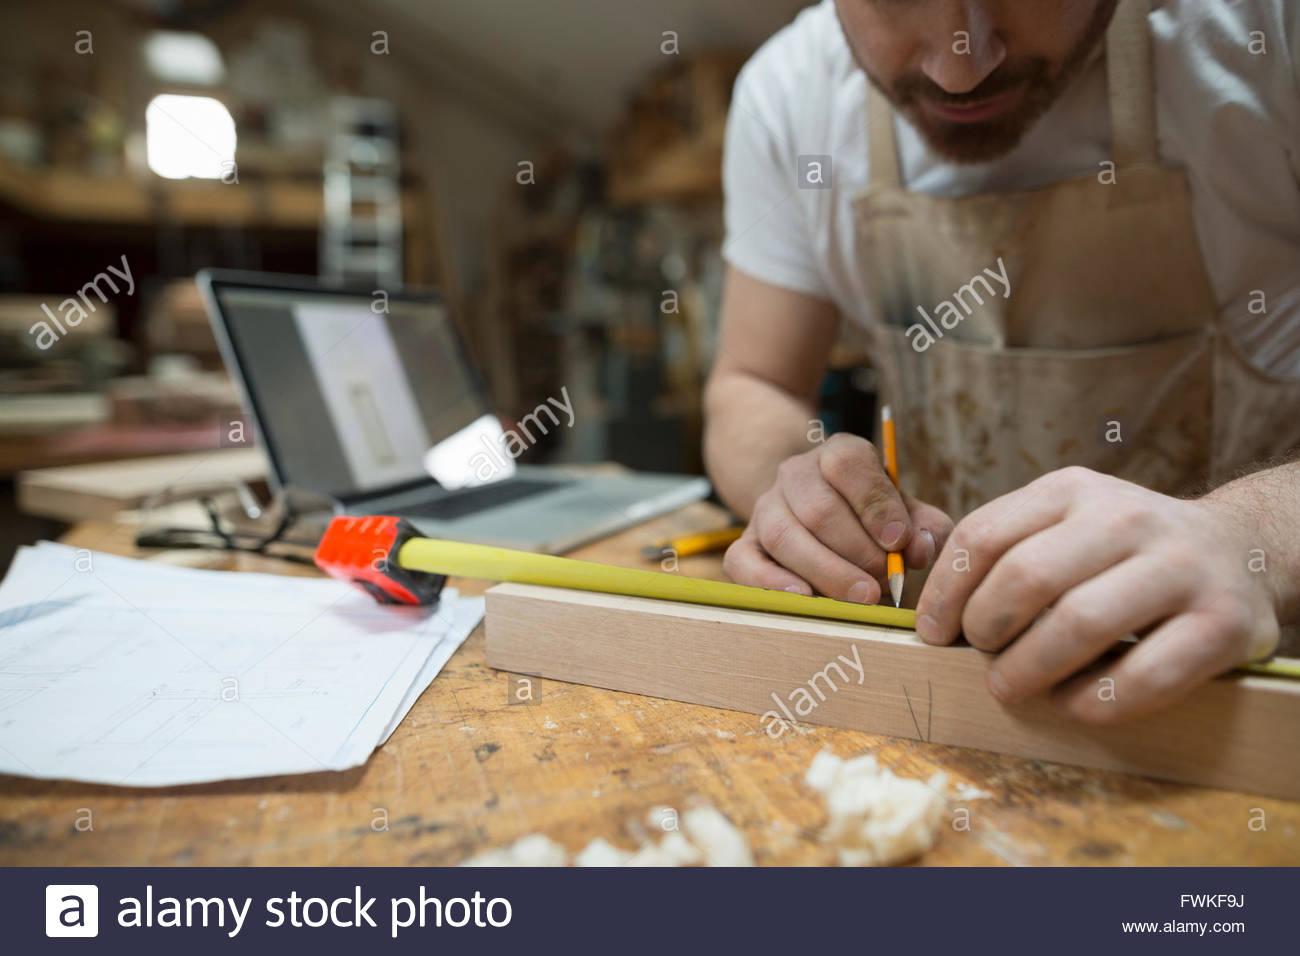 Carpenter measuring wood block in workshop - Stock Image